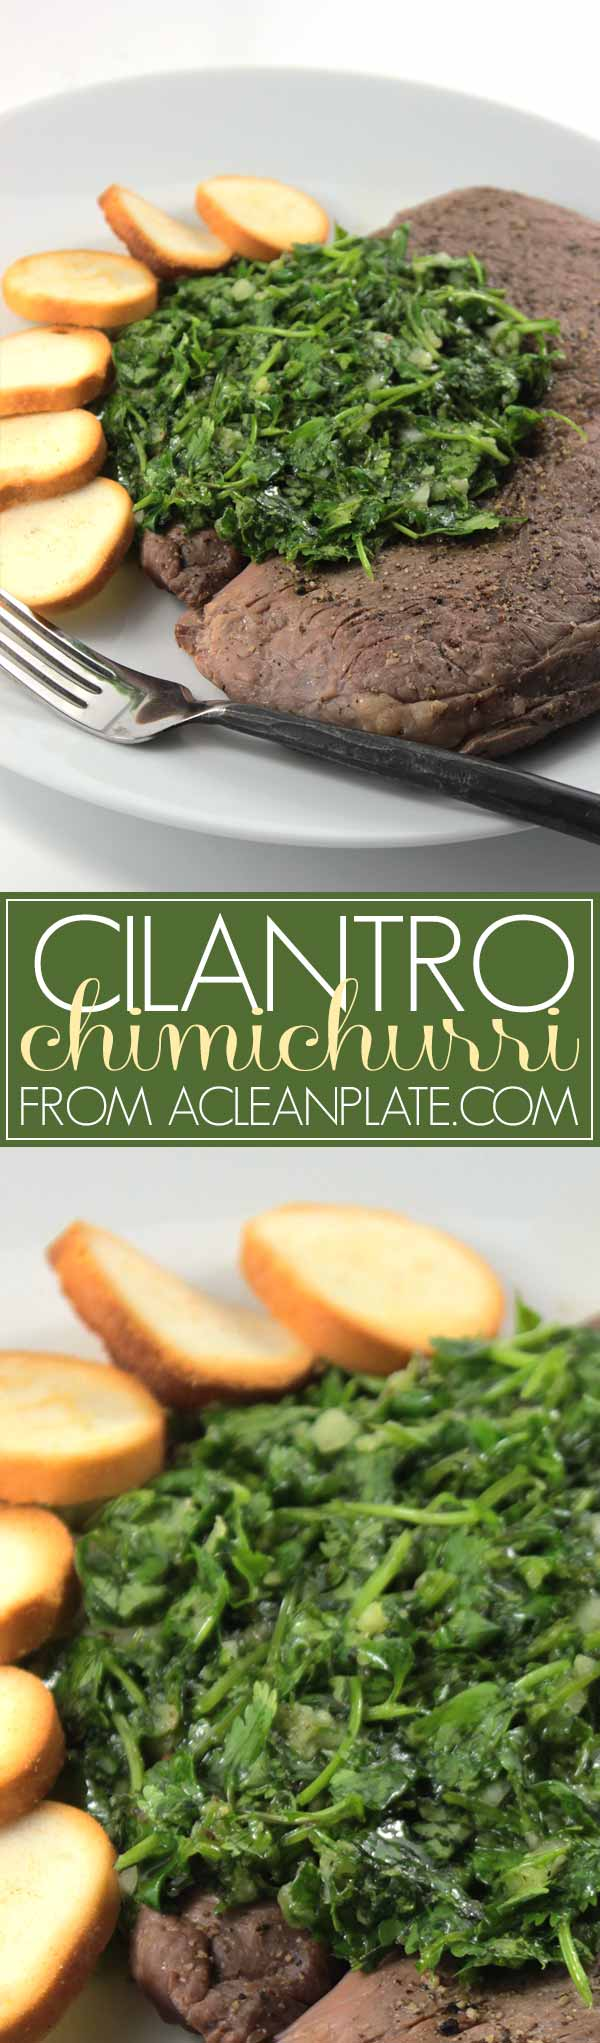 Cilantro Chimichurri recipe from acleanplate.com